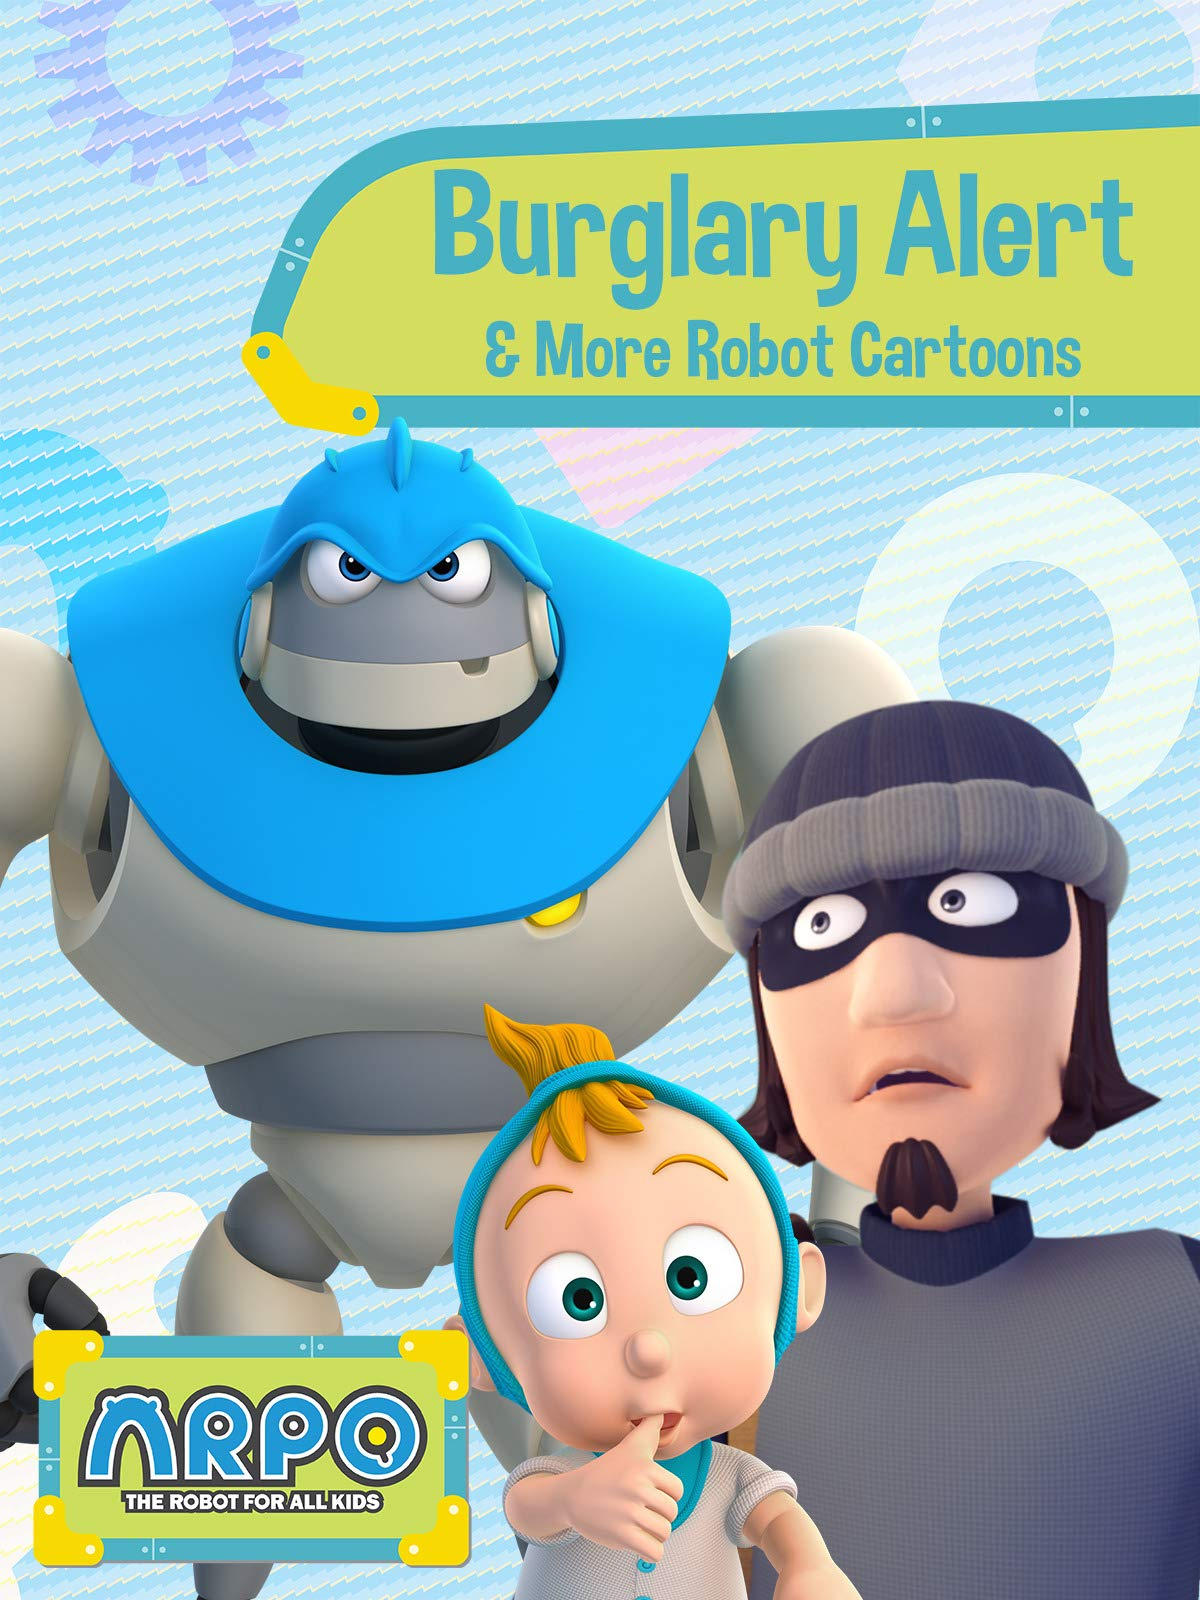 Arpo the Robot for All Kids - Burglary Alert & More Robot Cartoons